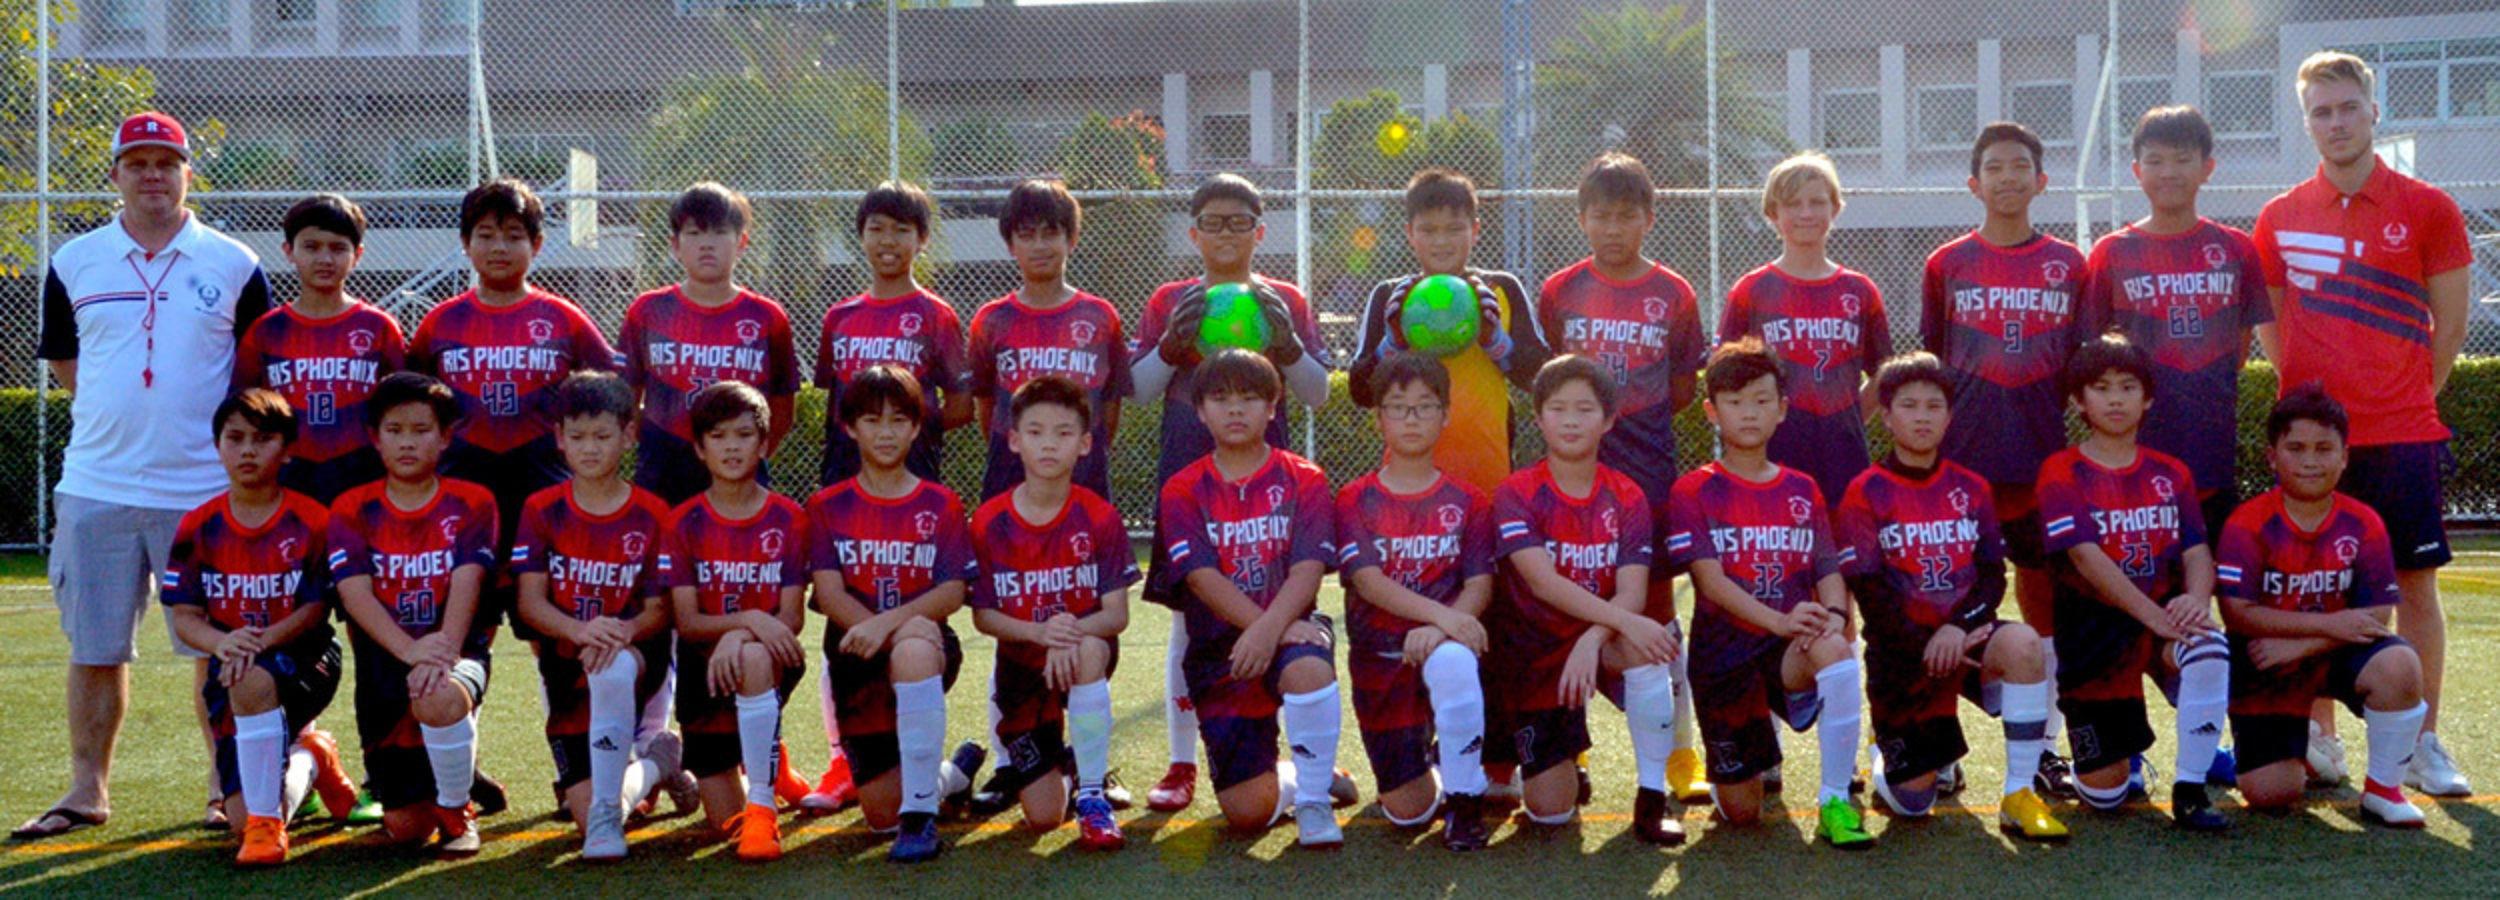 U13 Boys Soccer